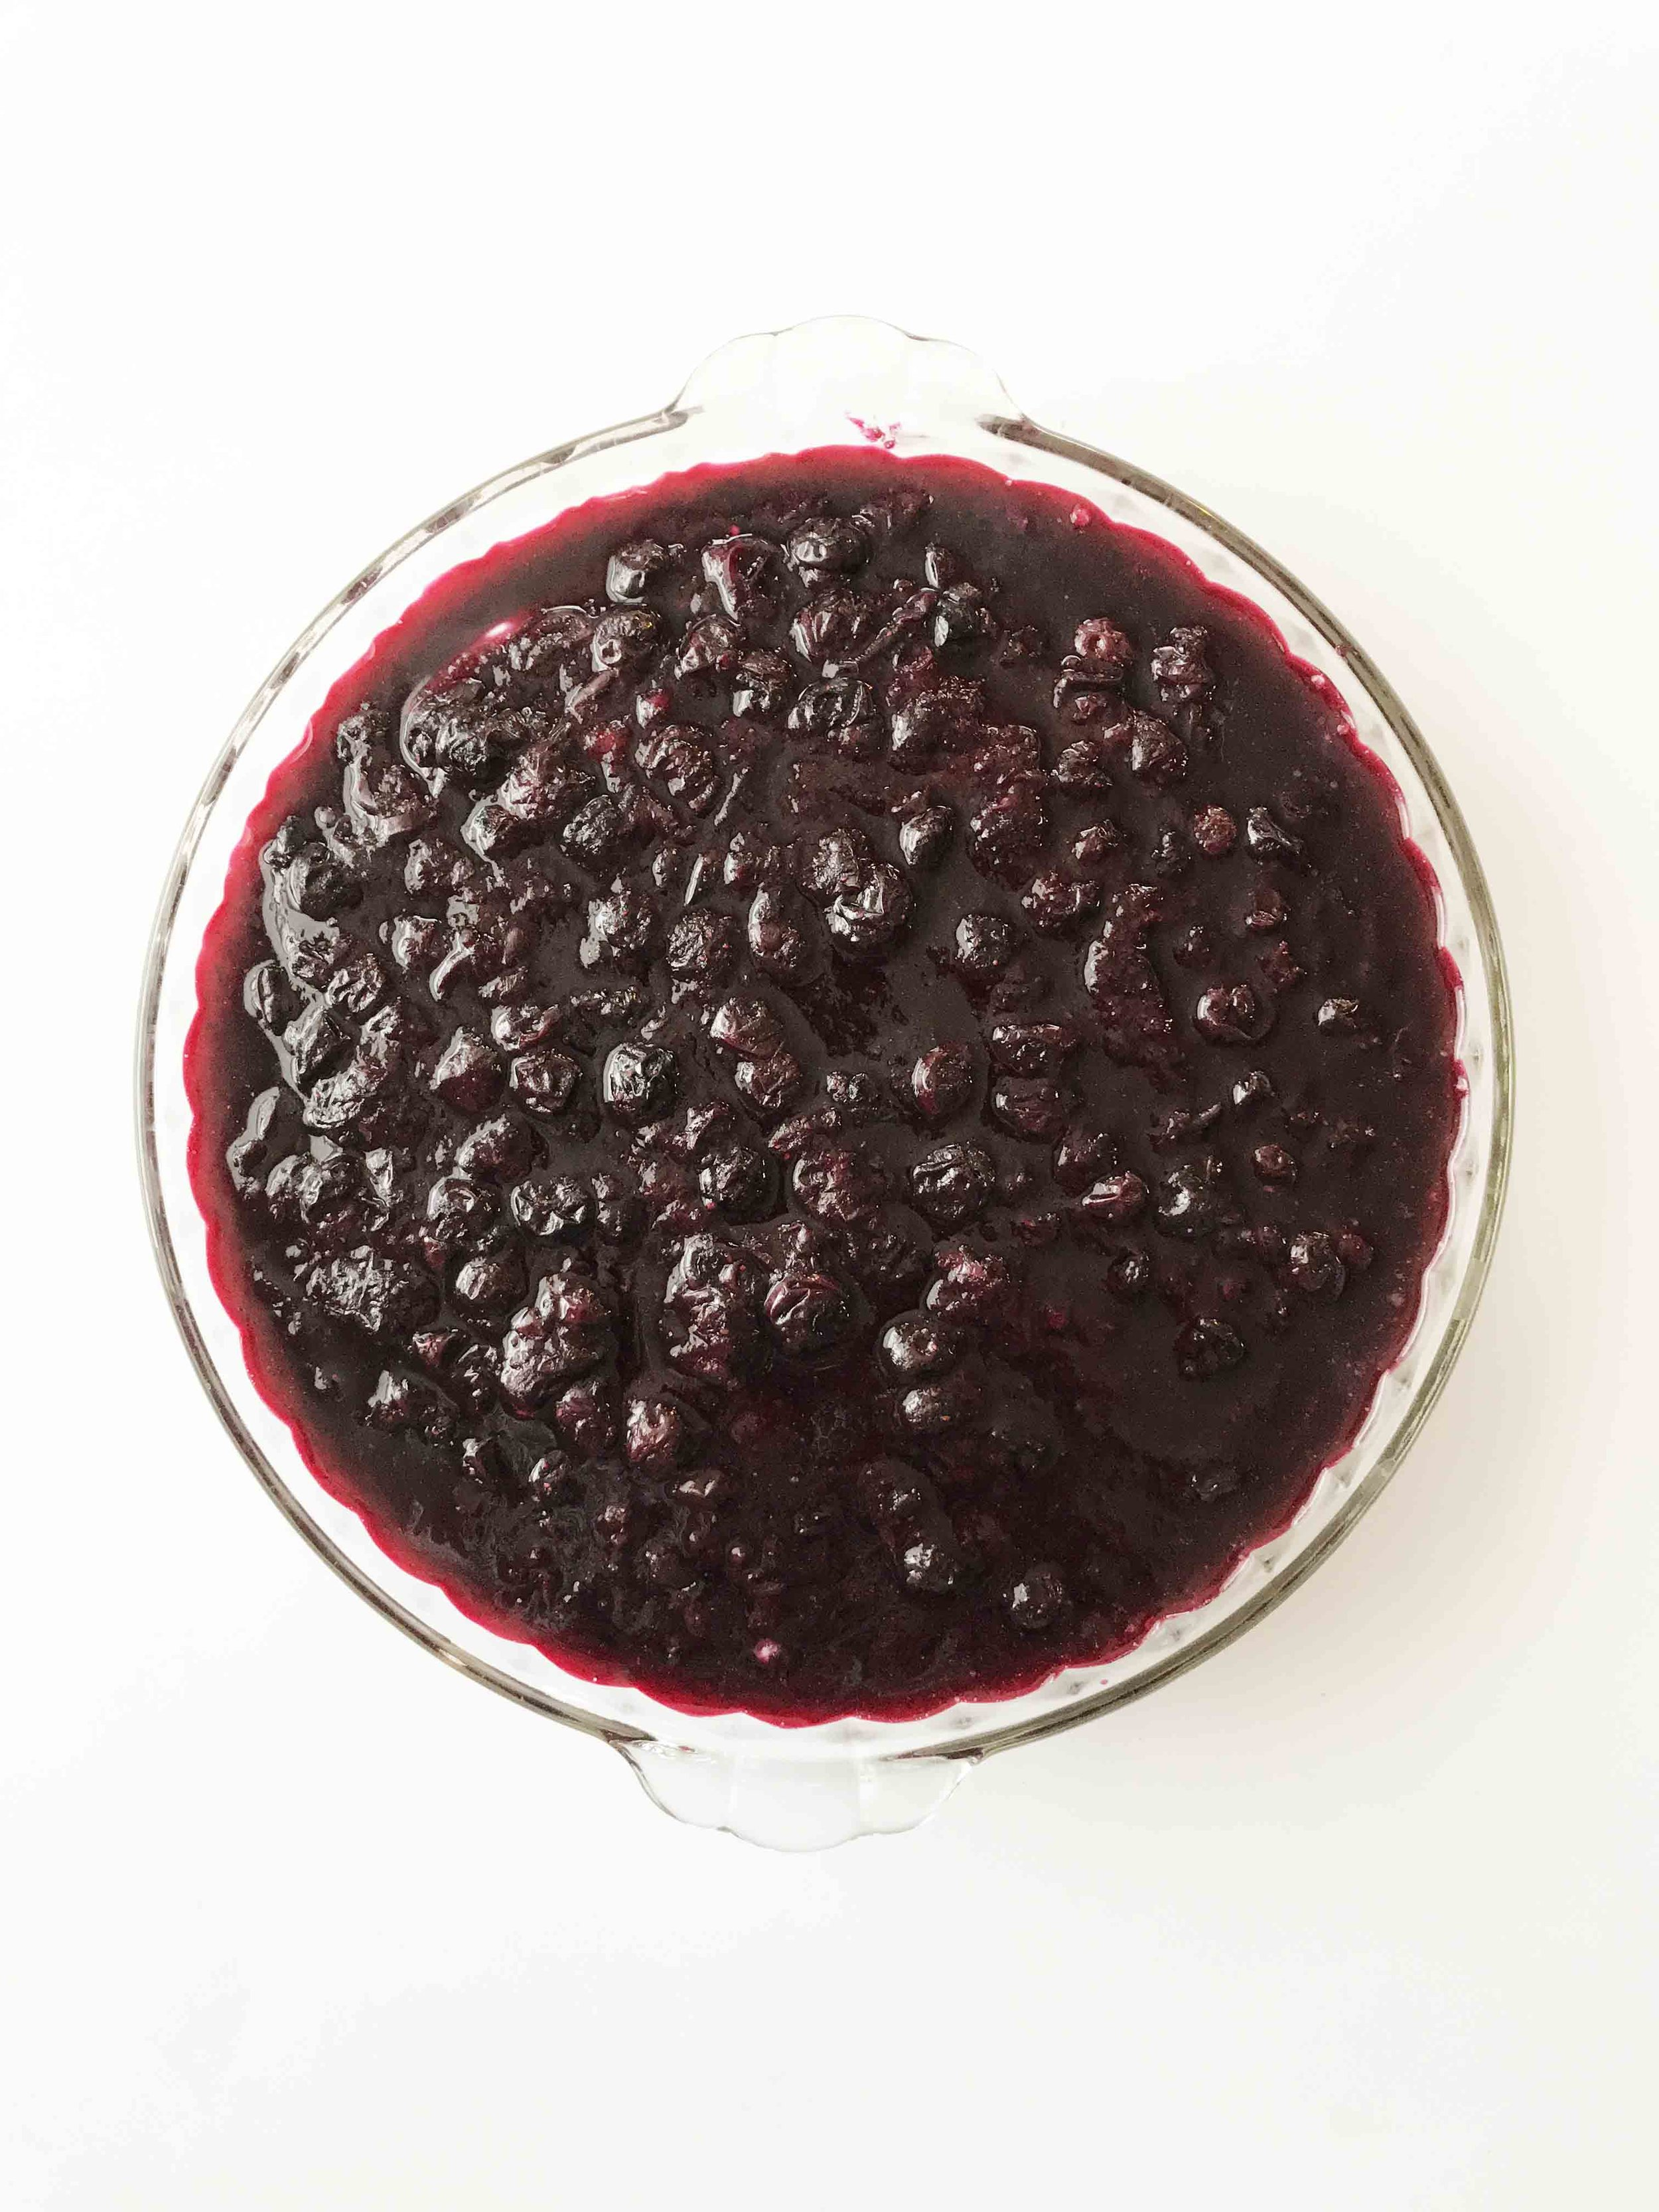 blueberry-cheesecake-dip10.jpg